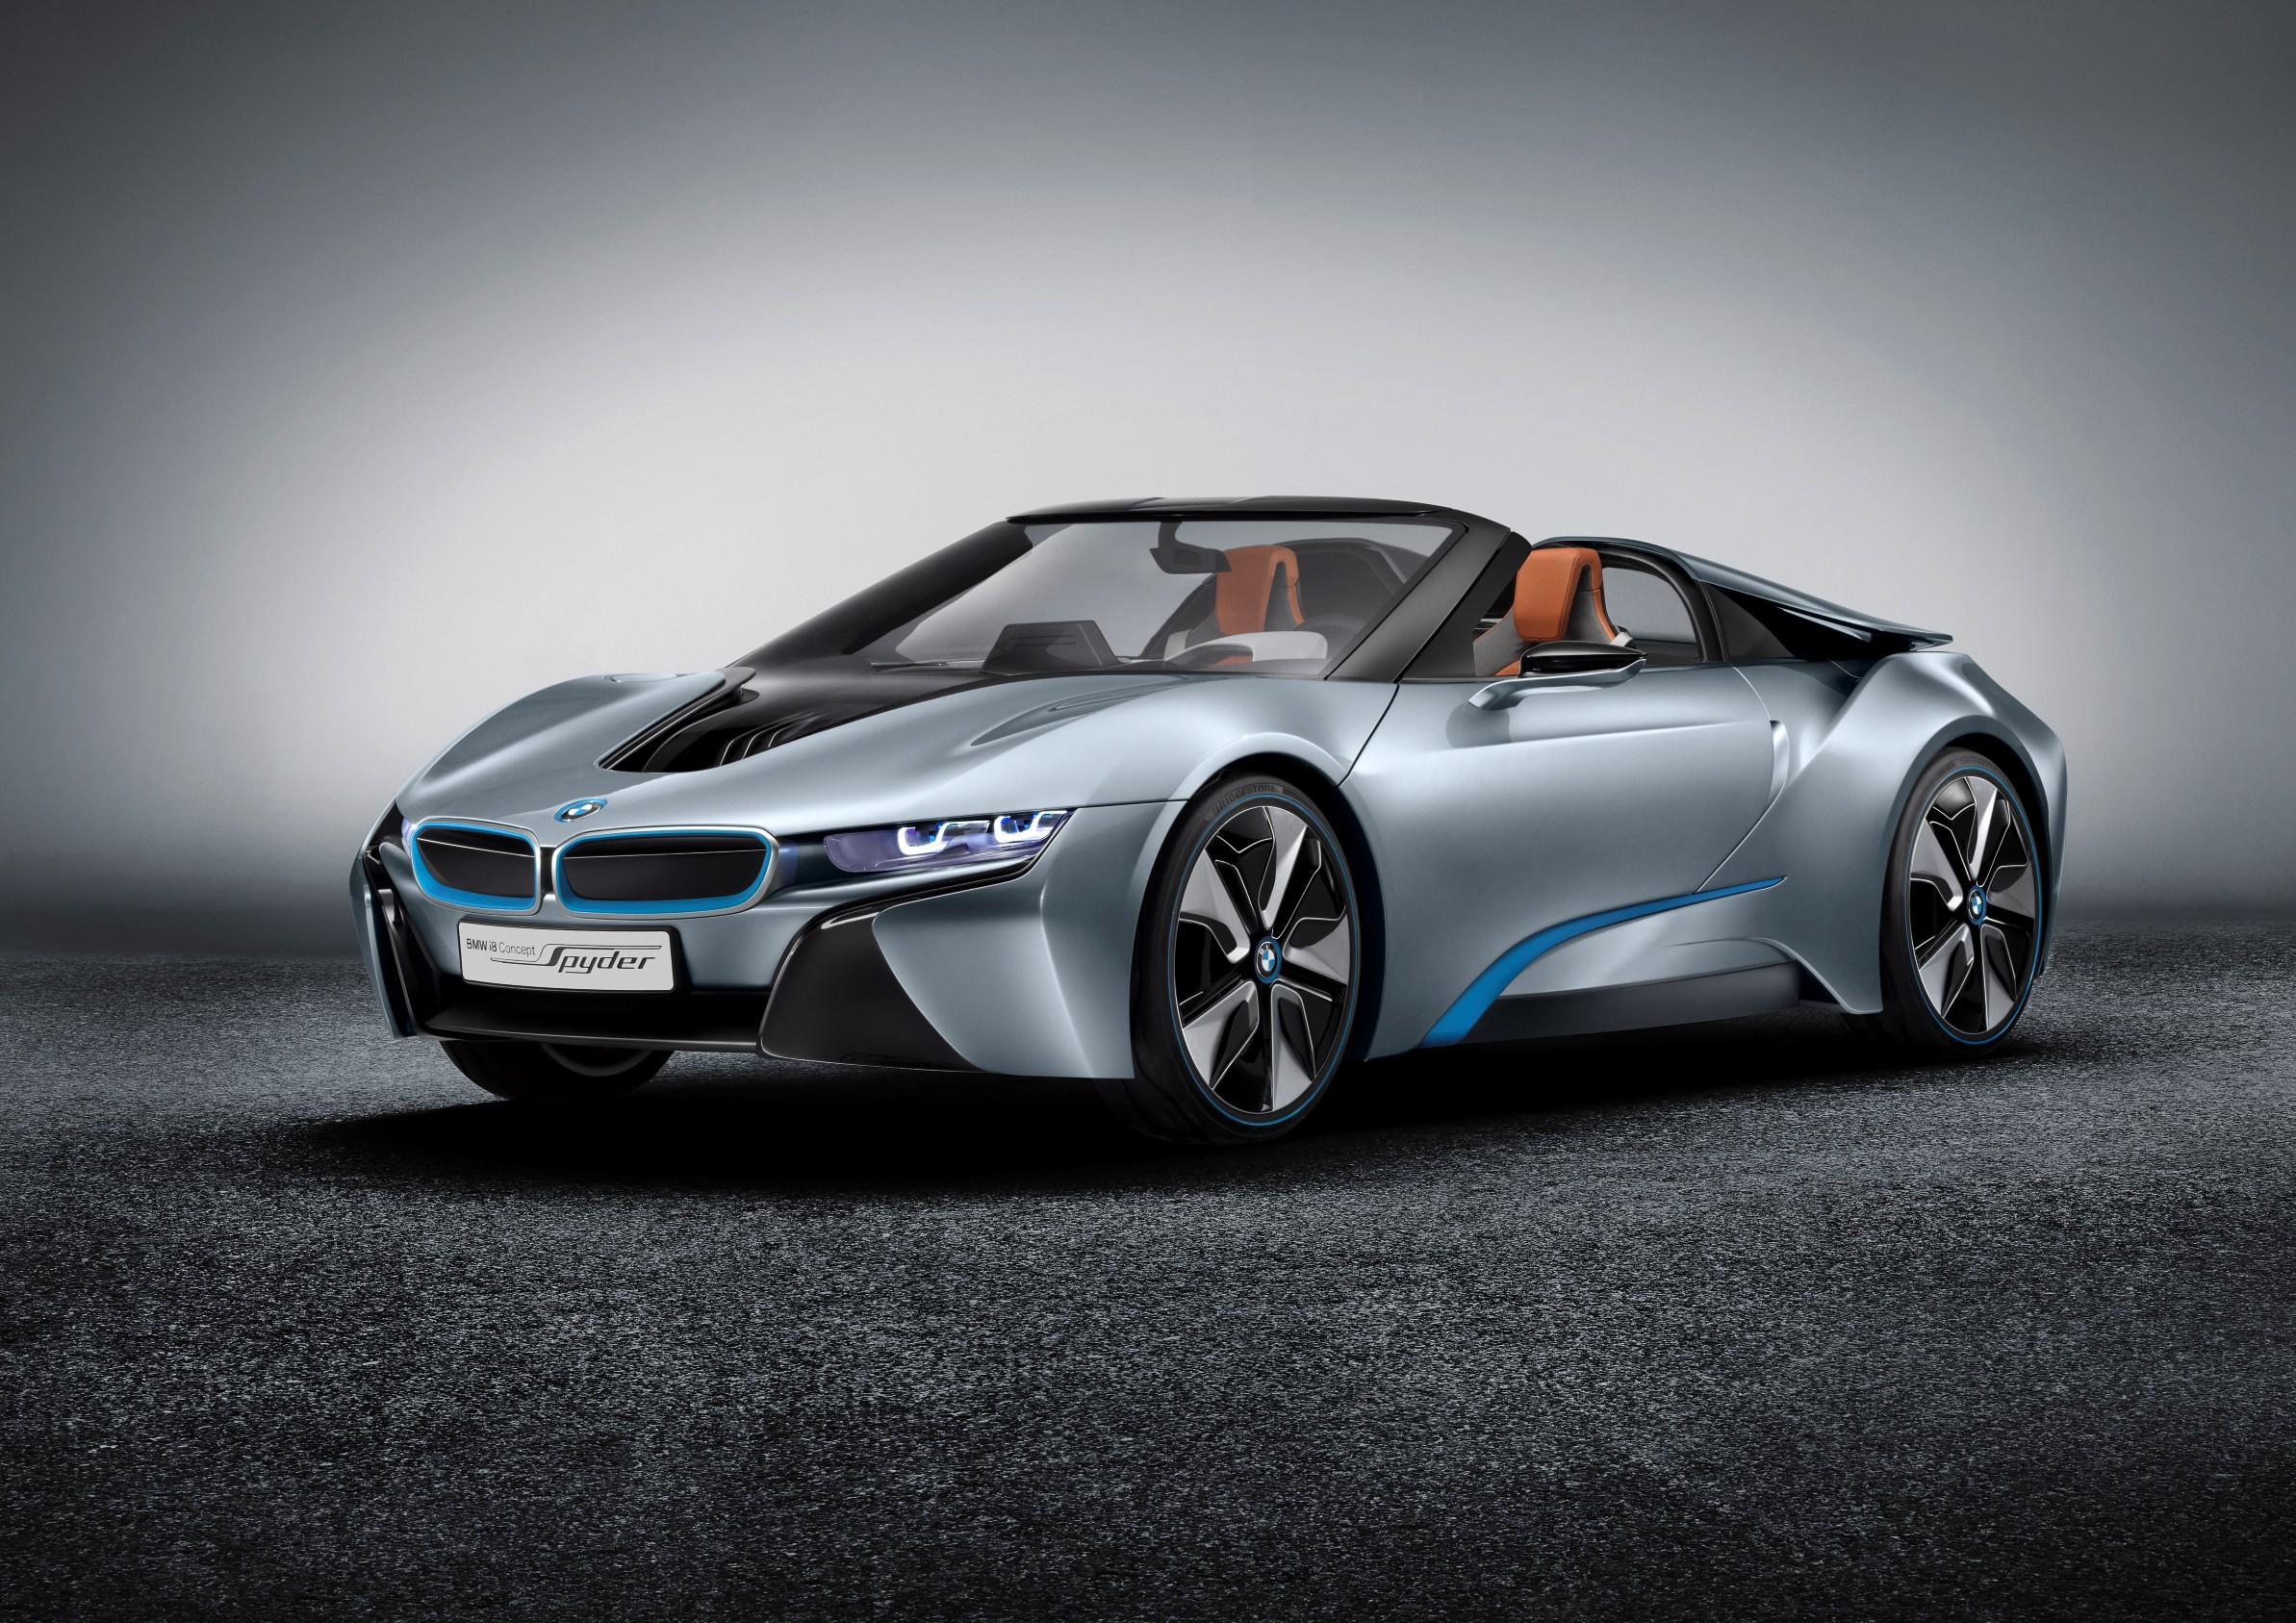 BMW's Electric Range Grows With 2015 BMW i8 Concept Spyder